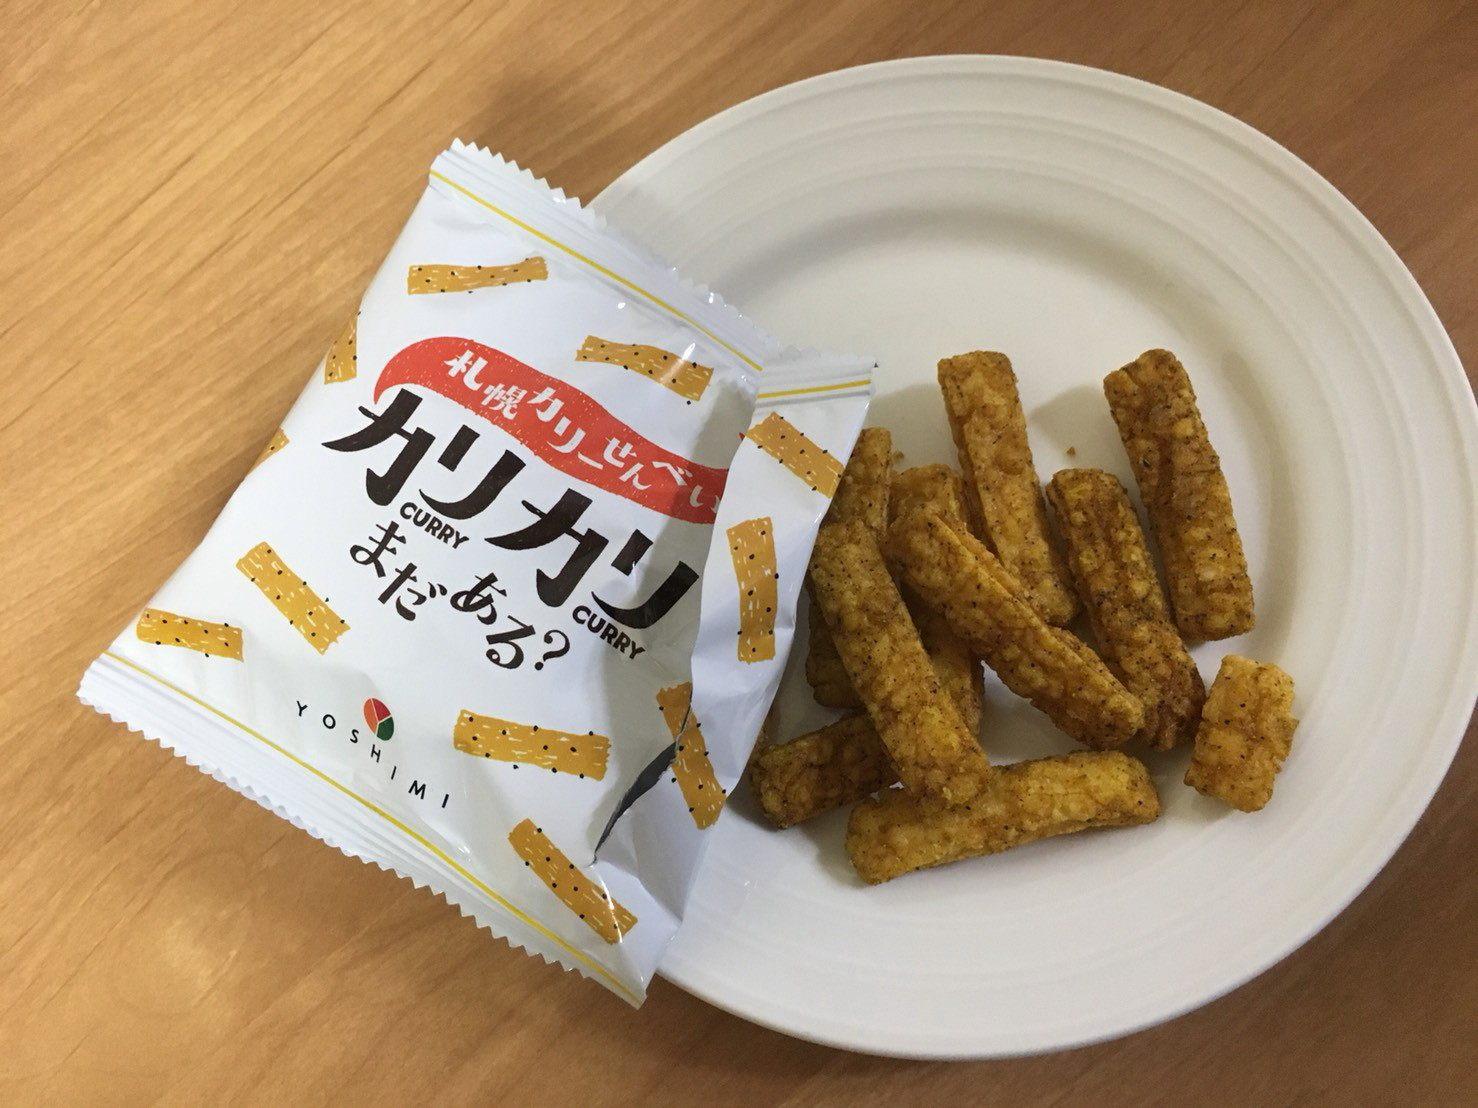 Rod-shaped rice crackers